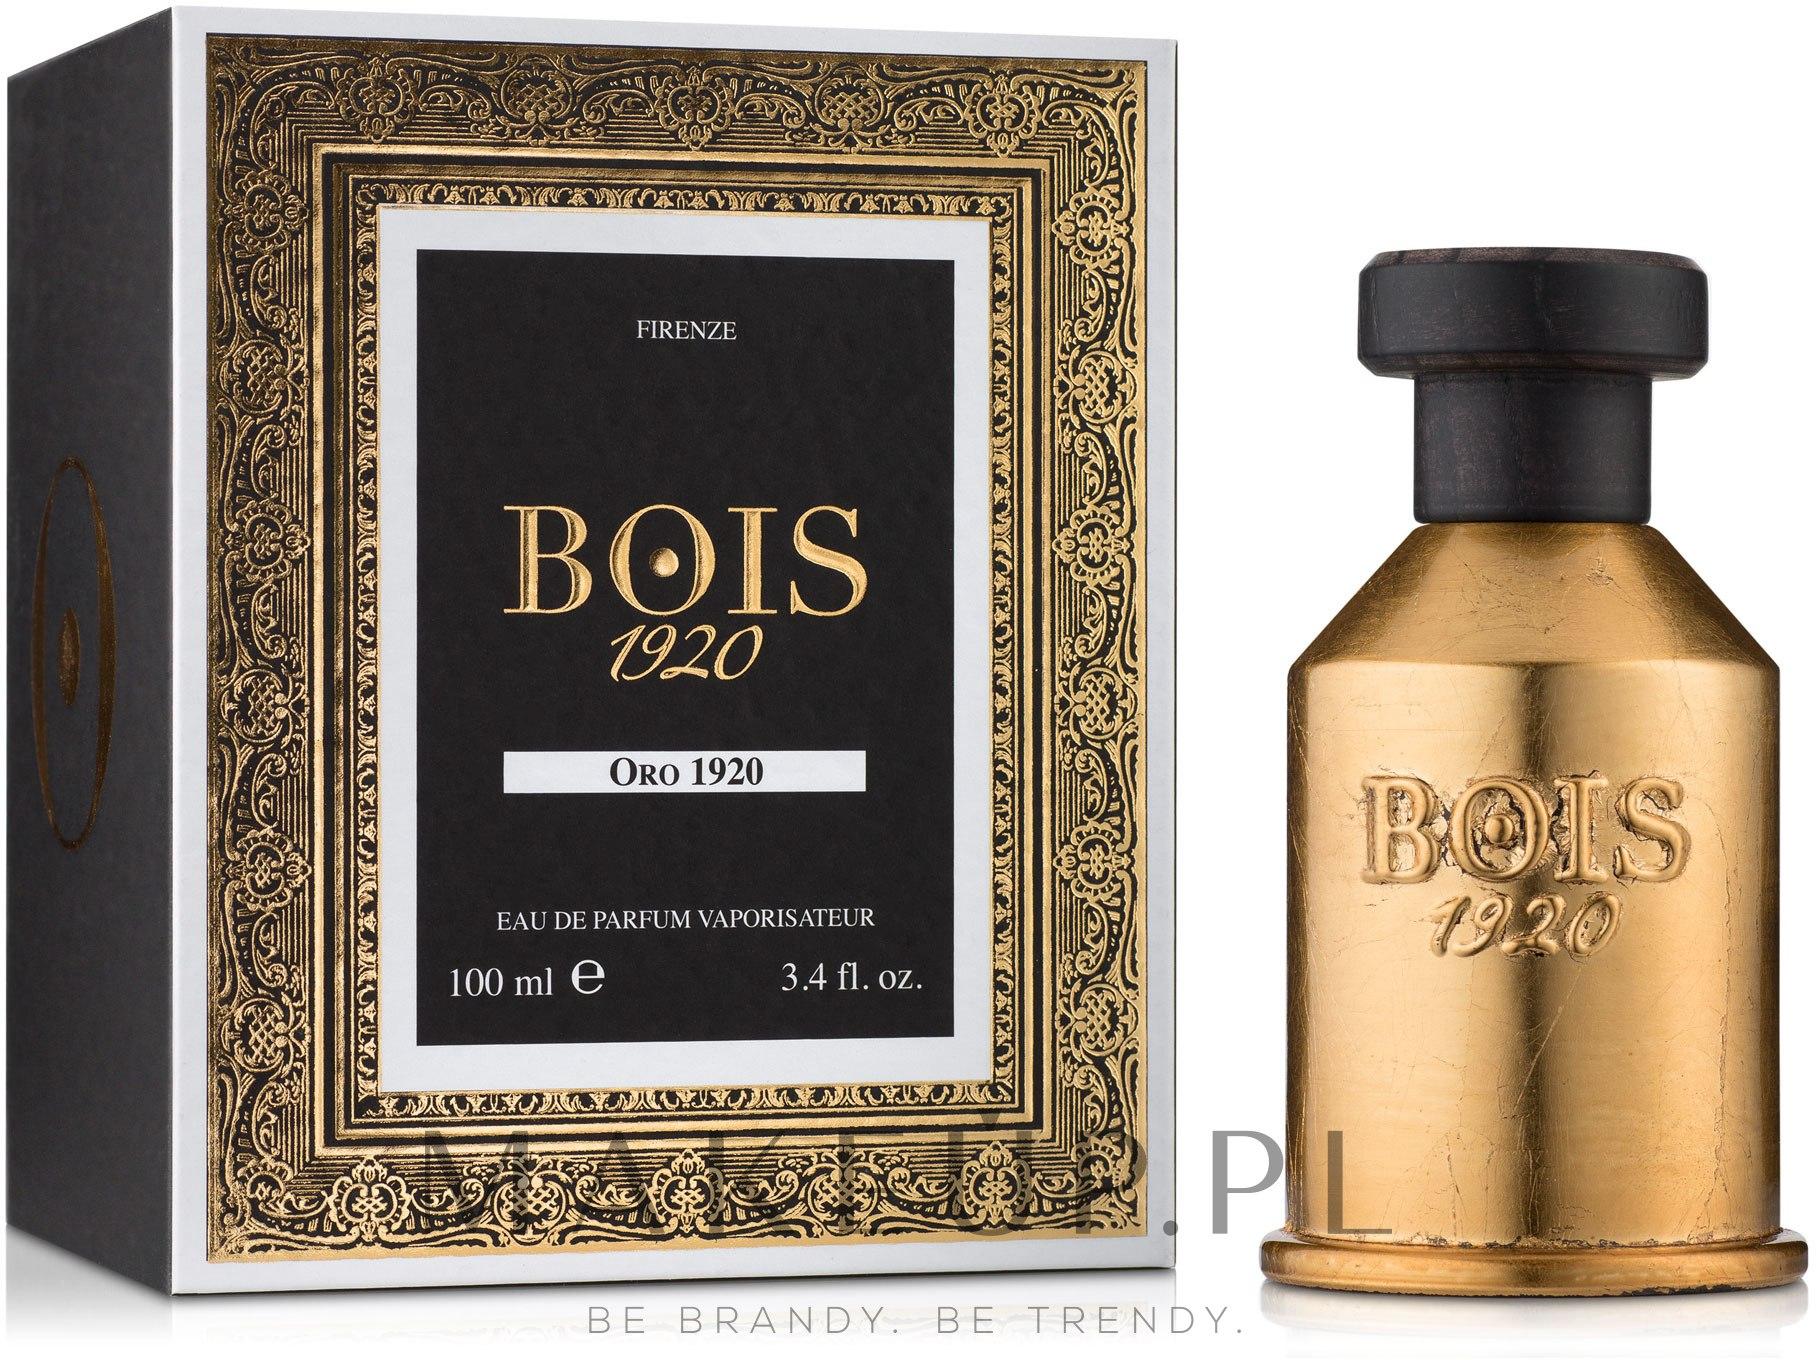 Bois 1920 Oro 1920 - Woda perfumowana — фото 100 ml